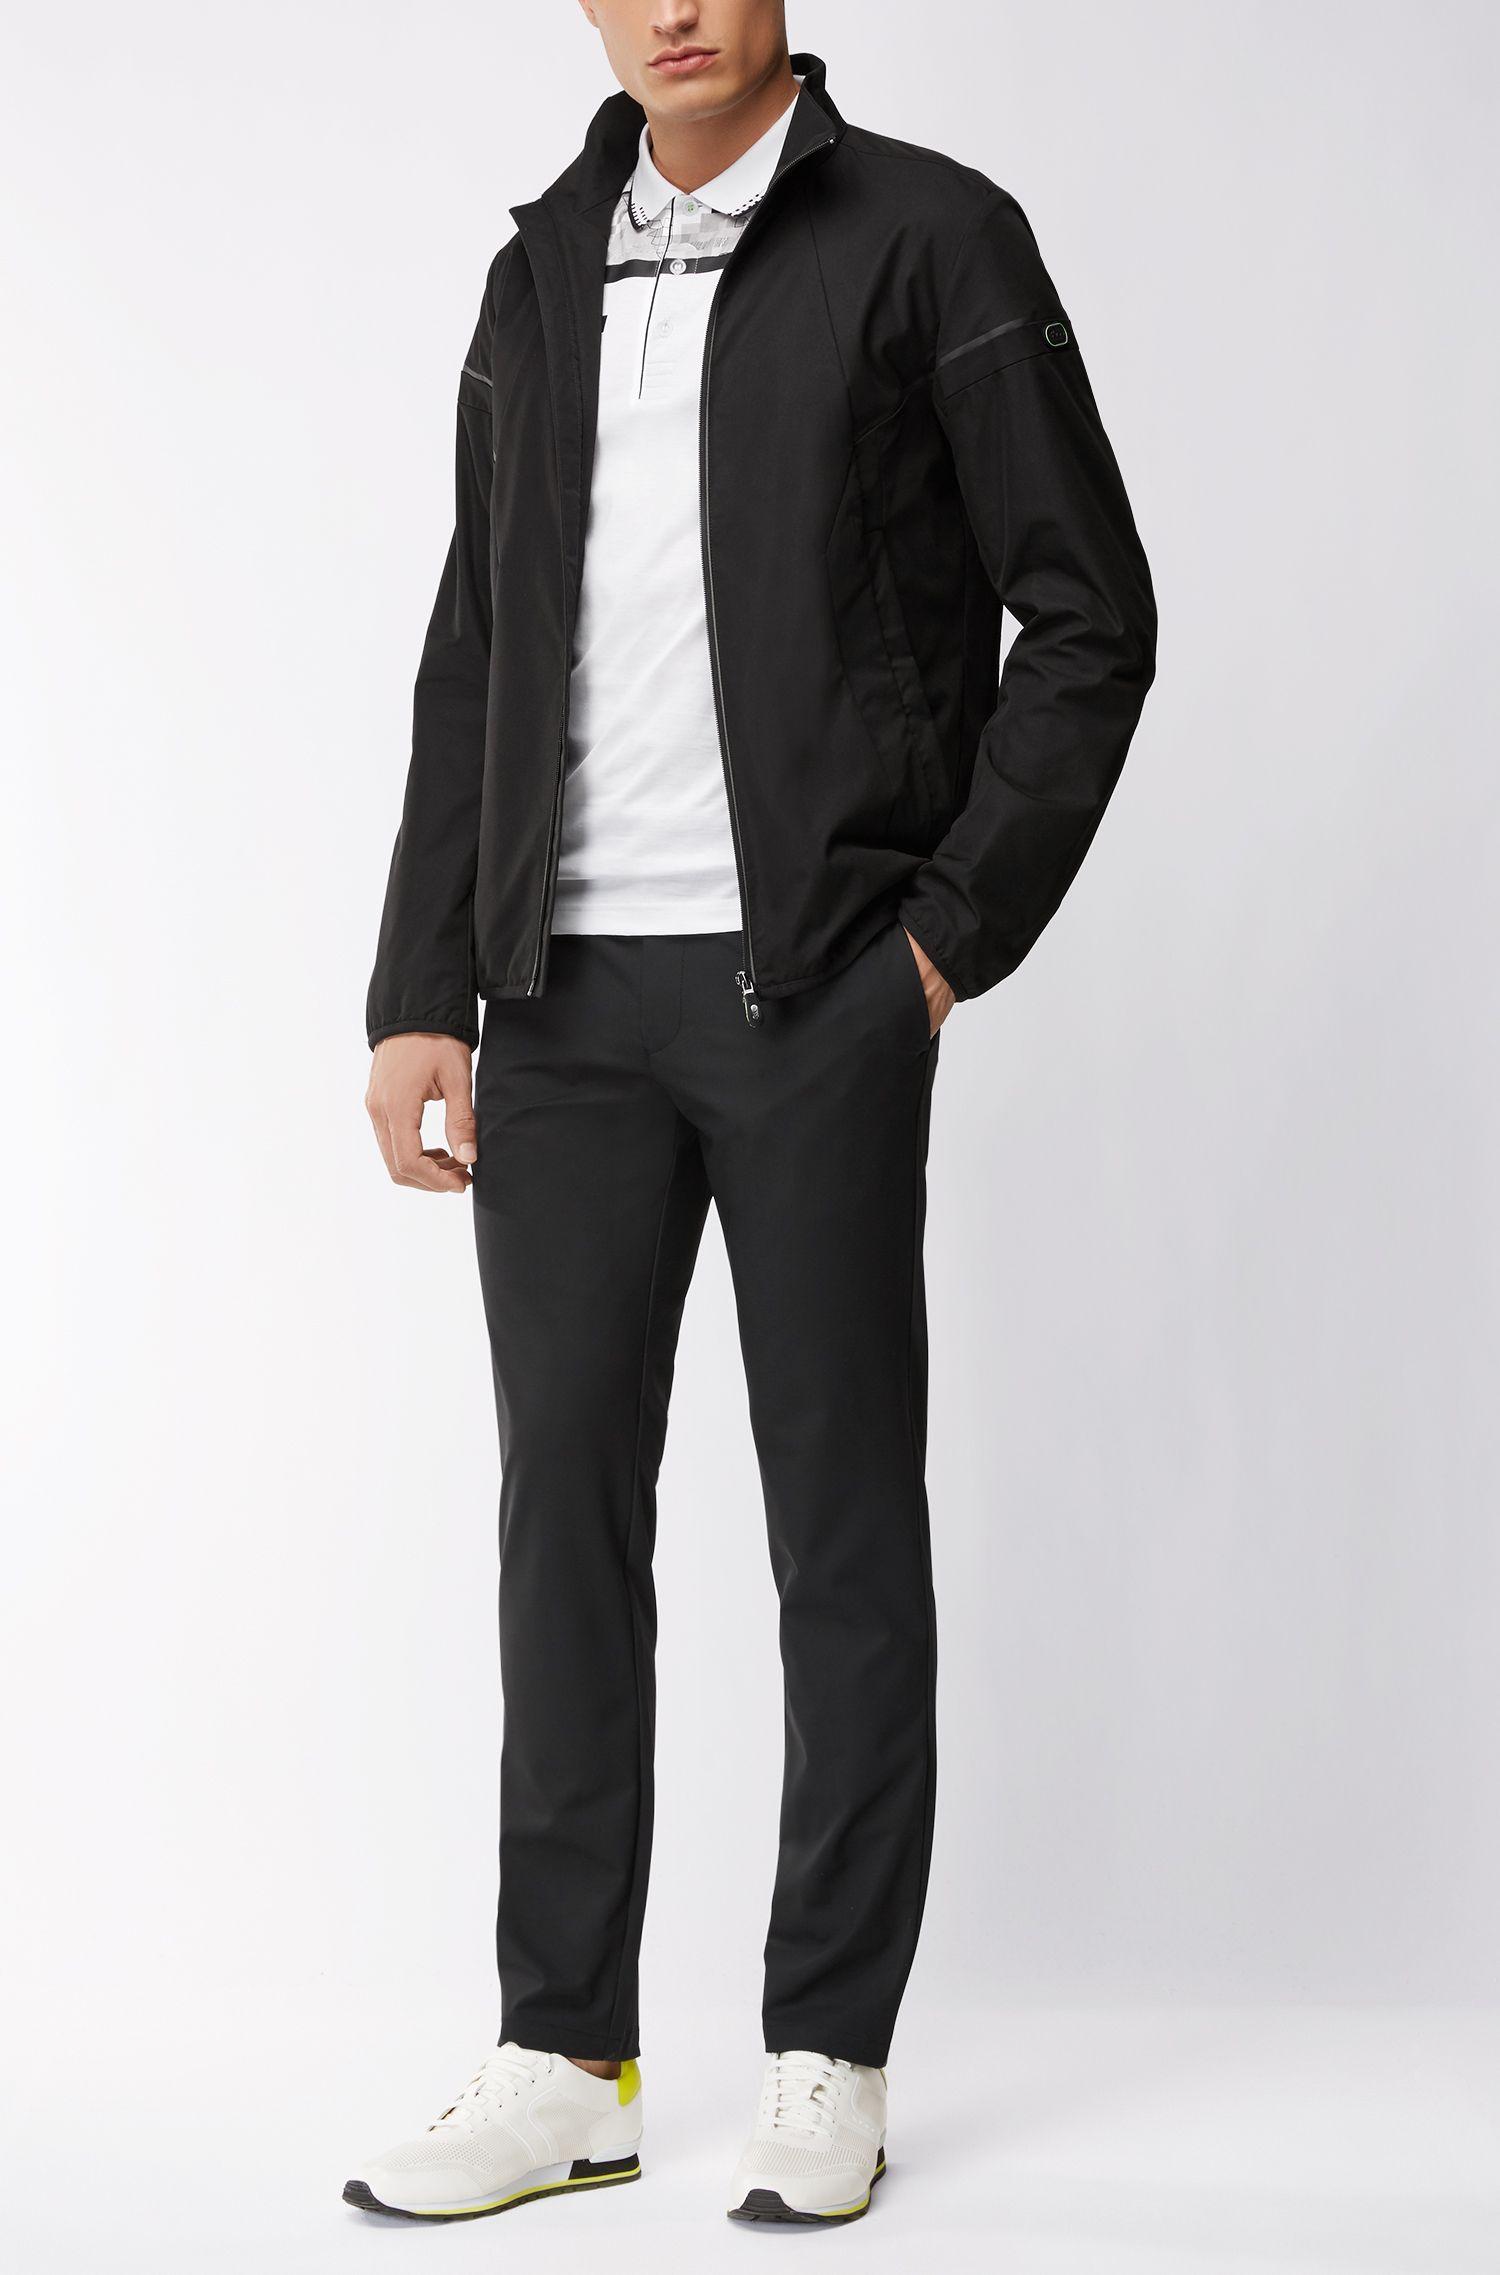 Geometric Mercerized Cotton Polo Shirt, Slim Fit | Paule, White